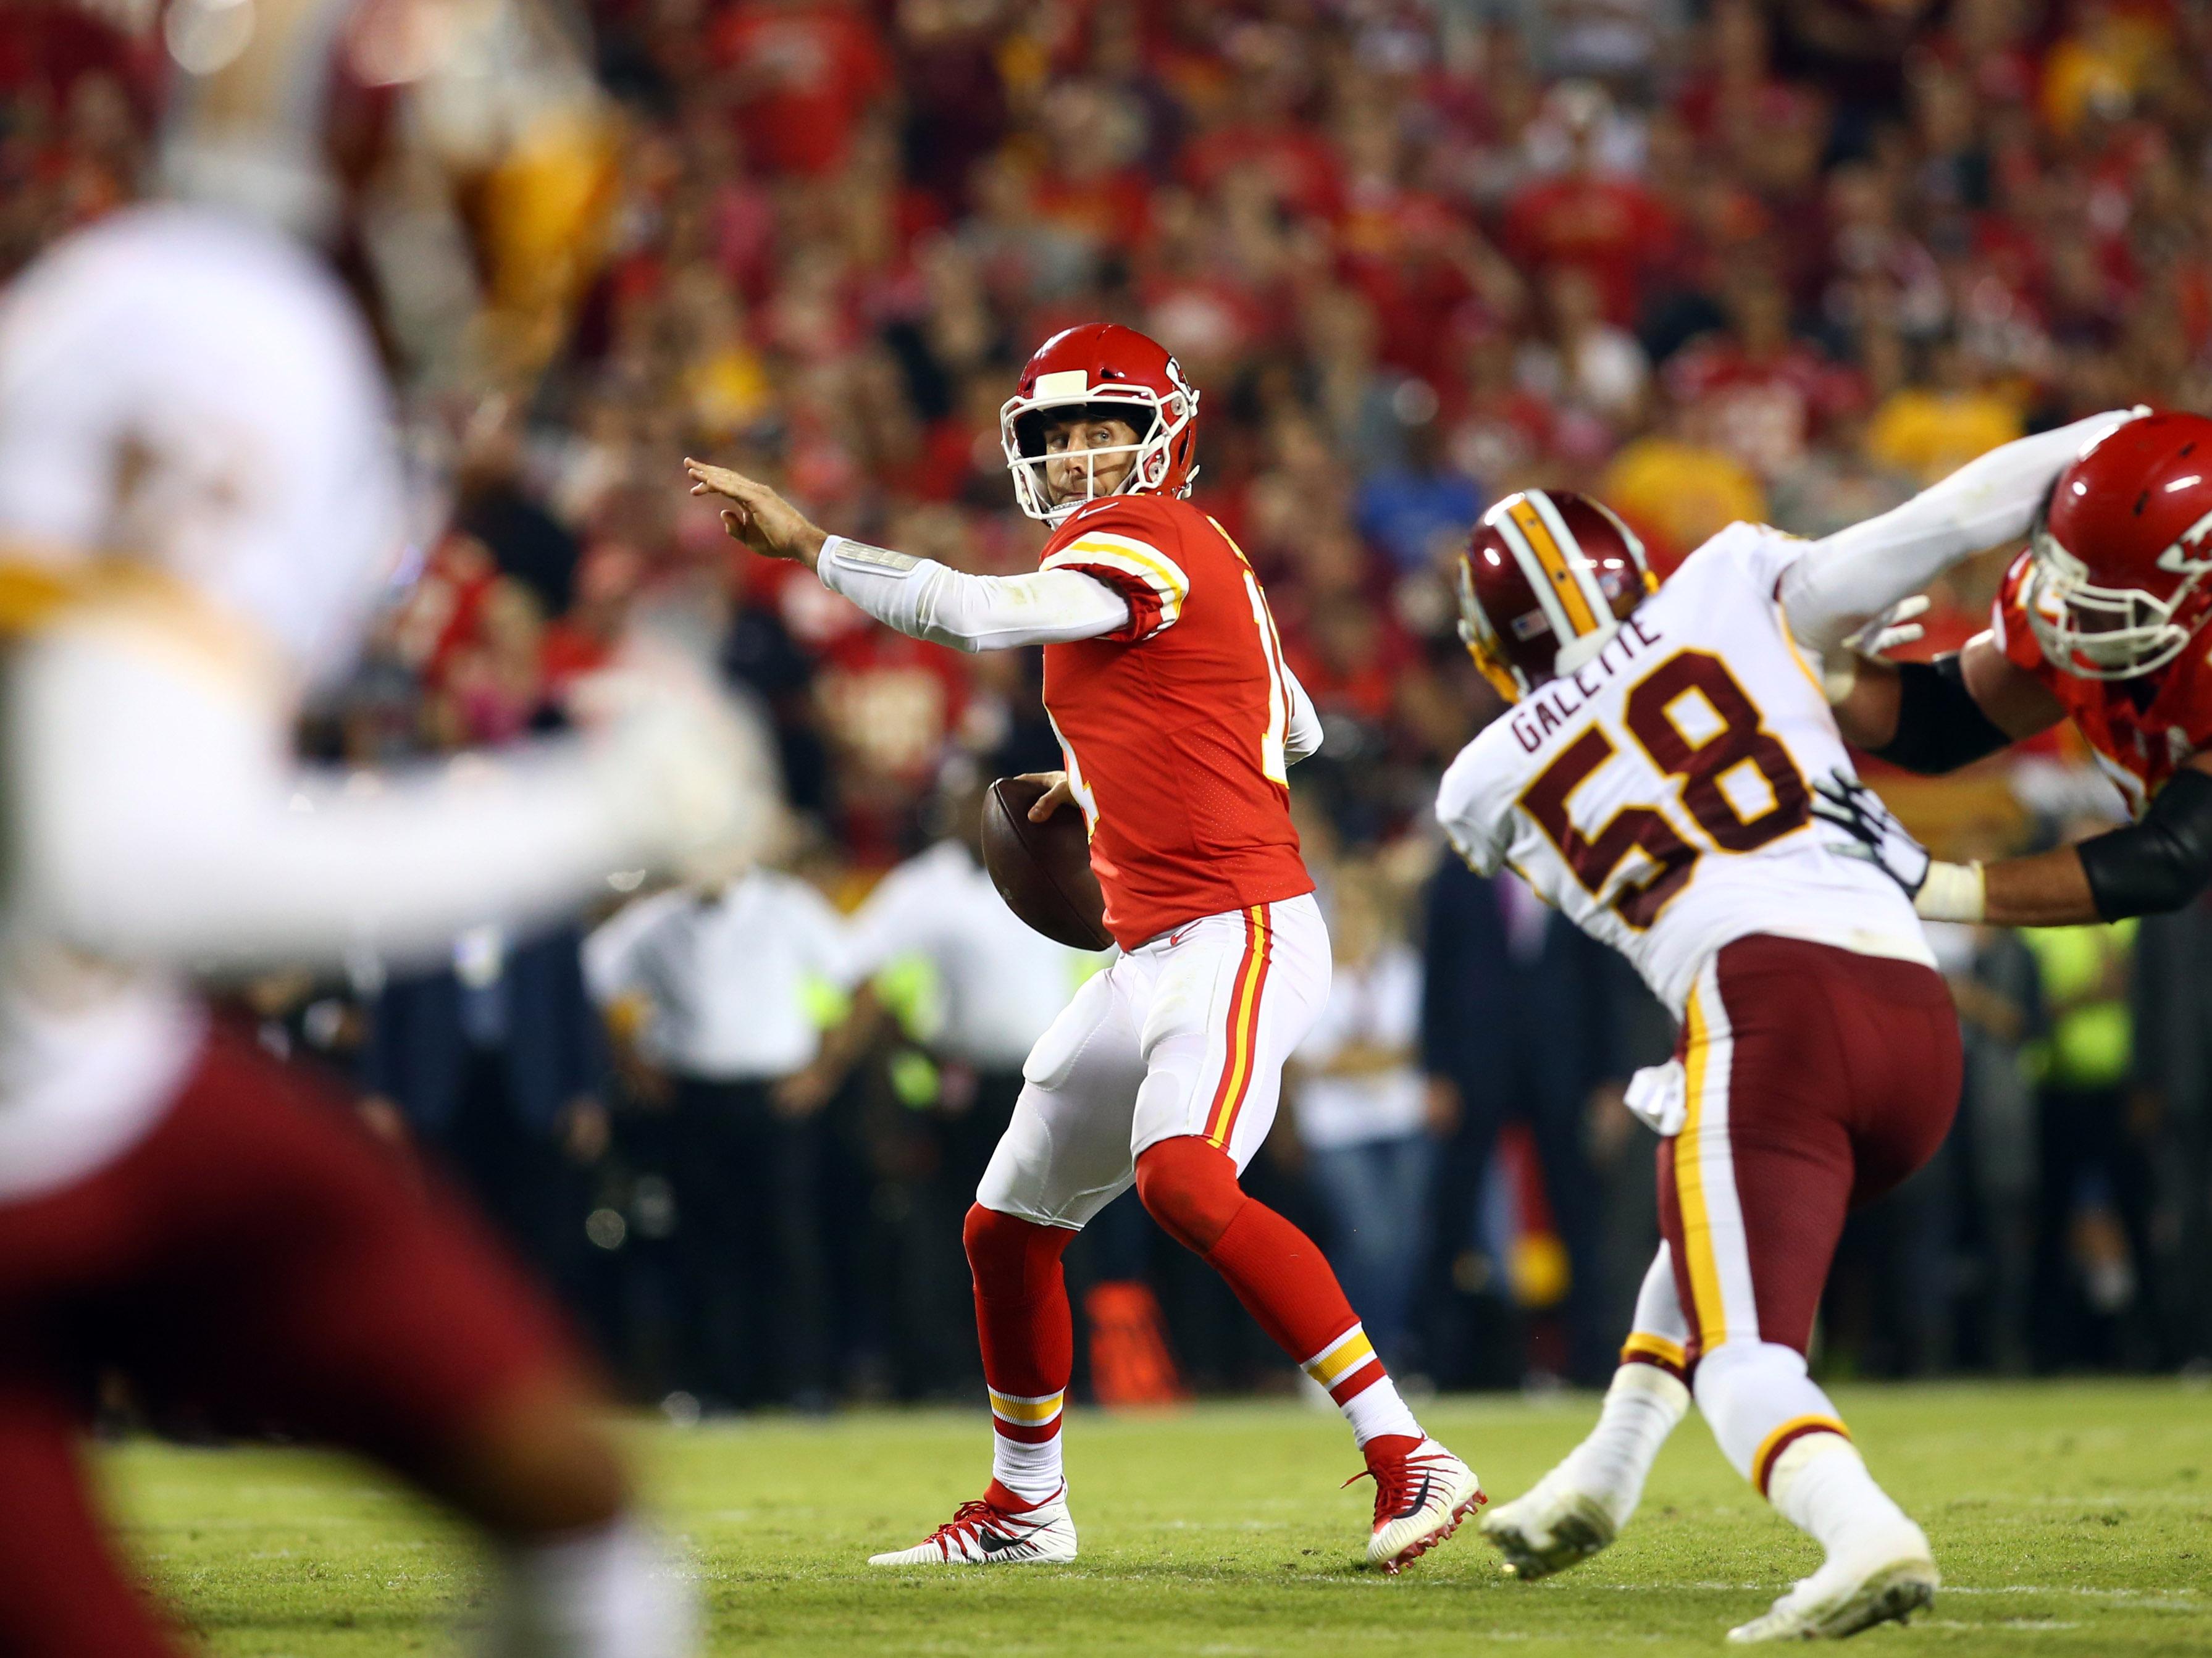 NFL: Washington Redskins at Kansas City Chiefs